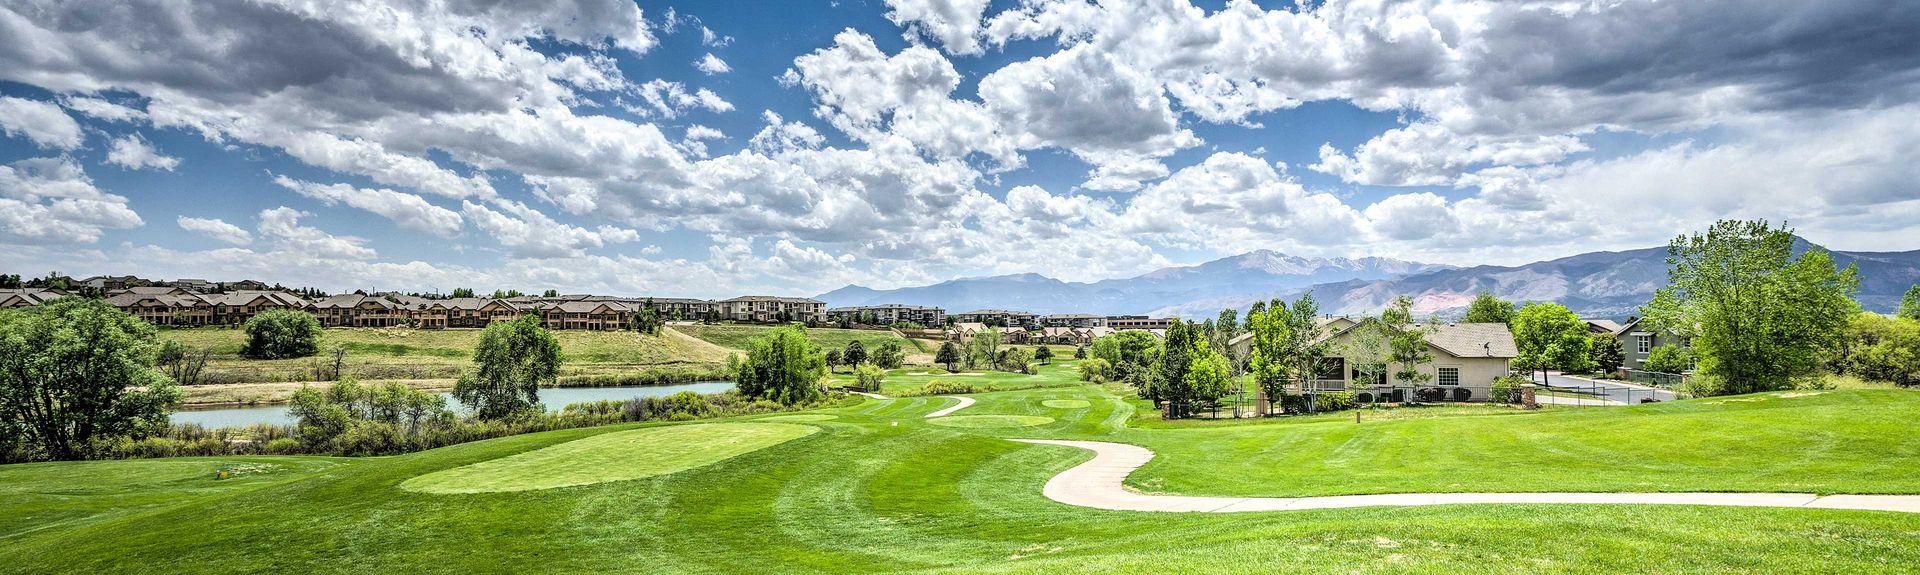 Northgate, Colorado Springs, CO, USA